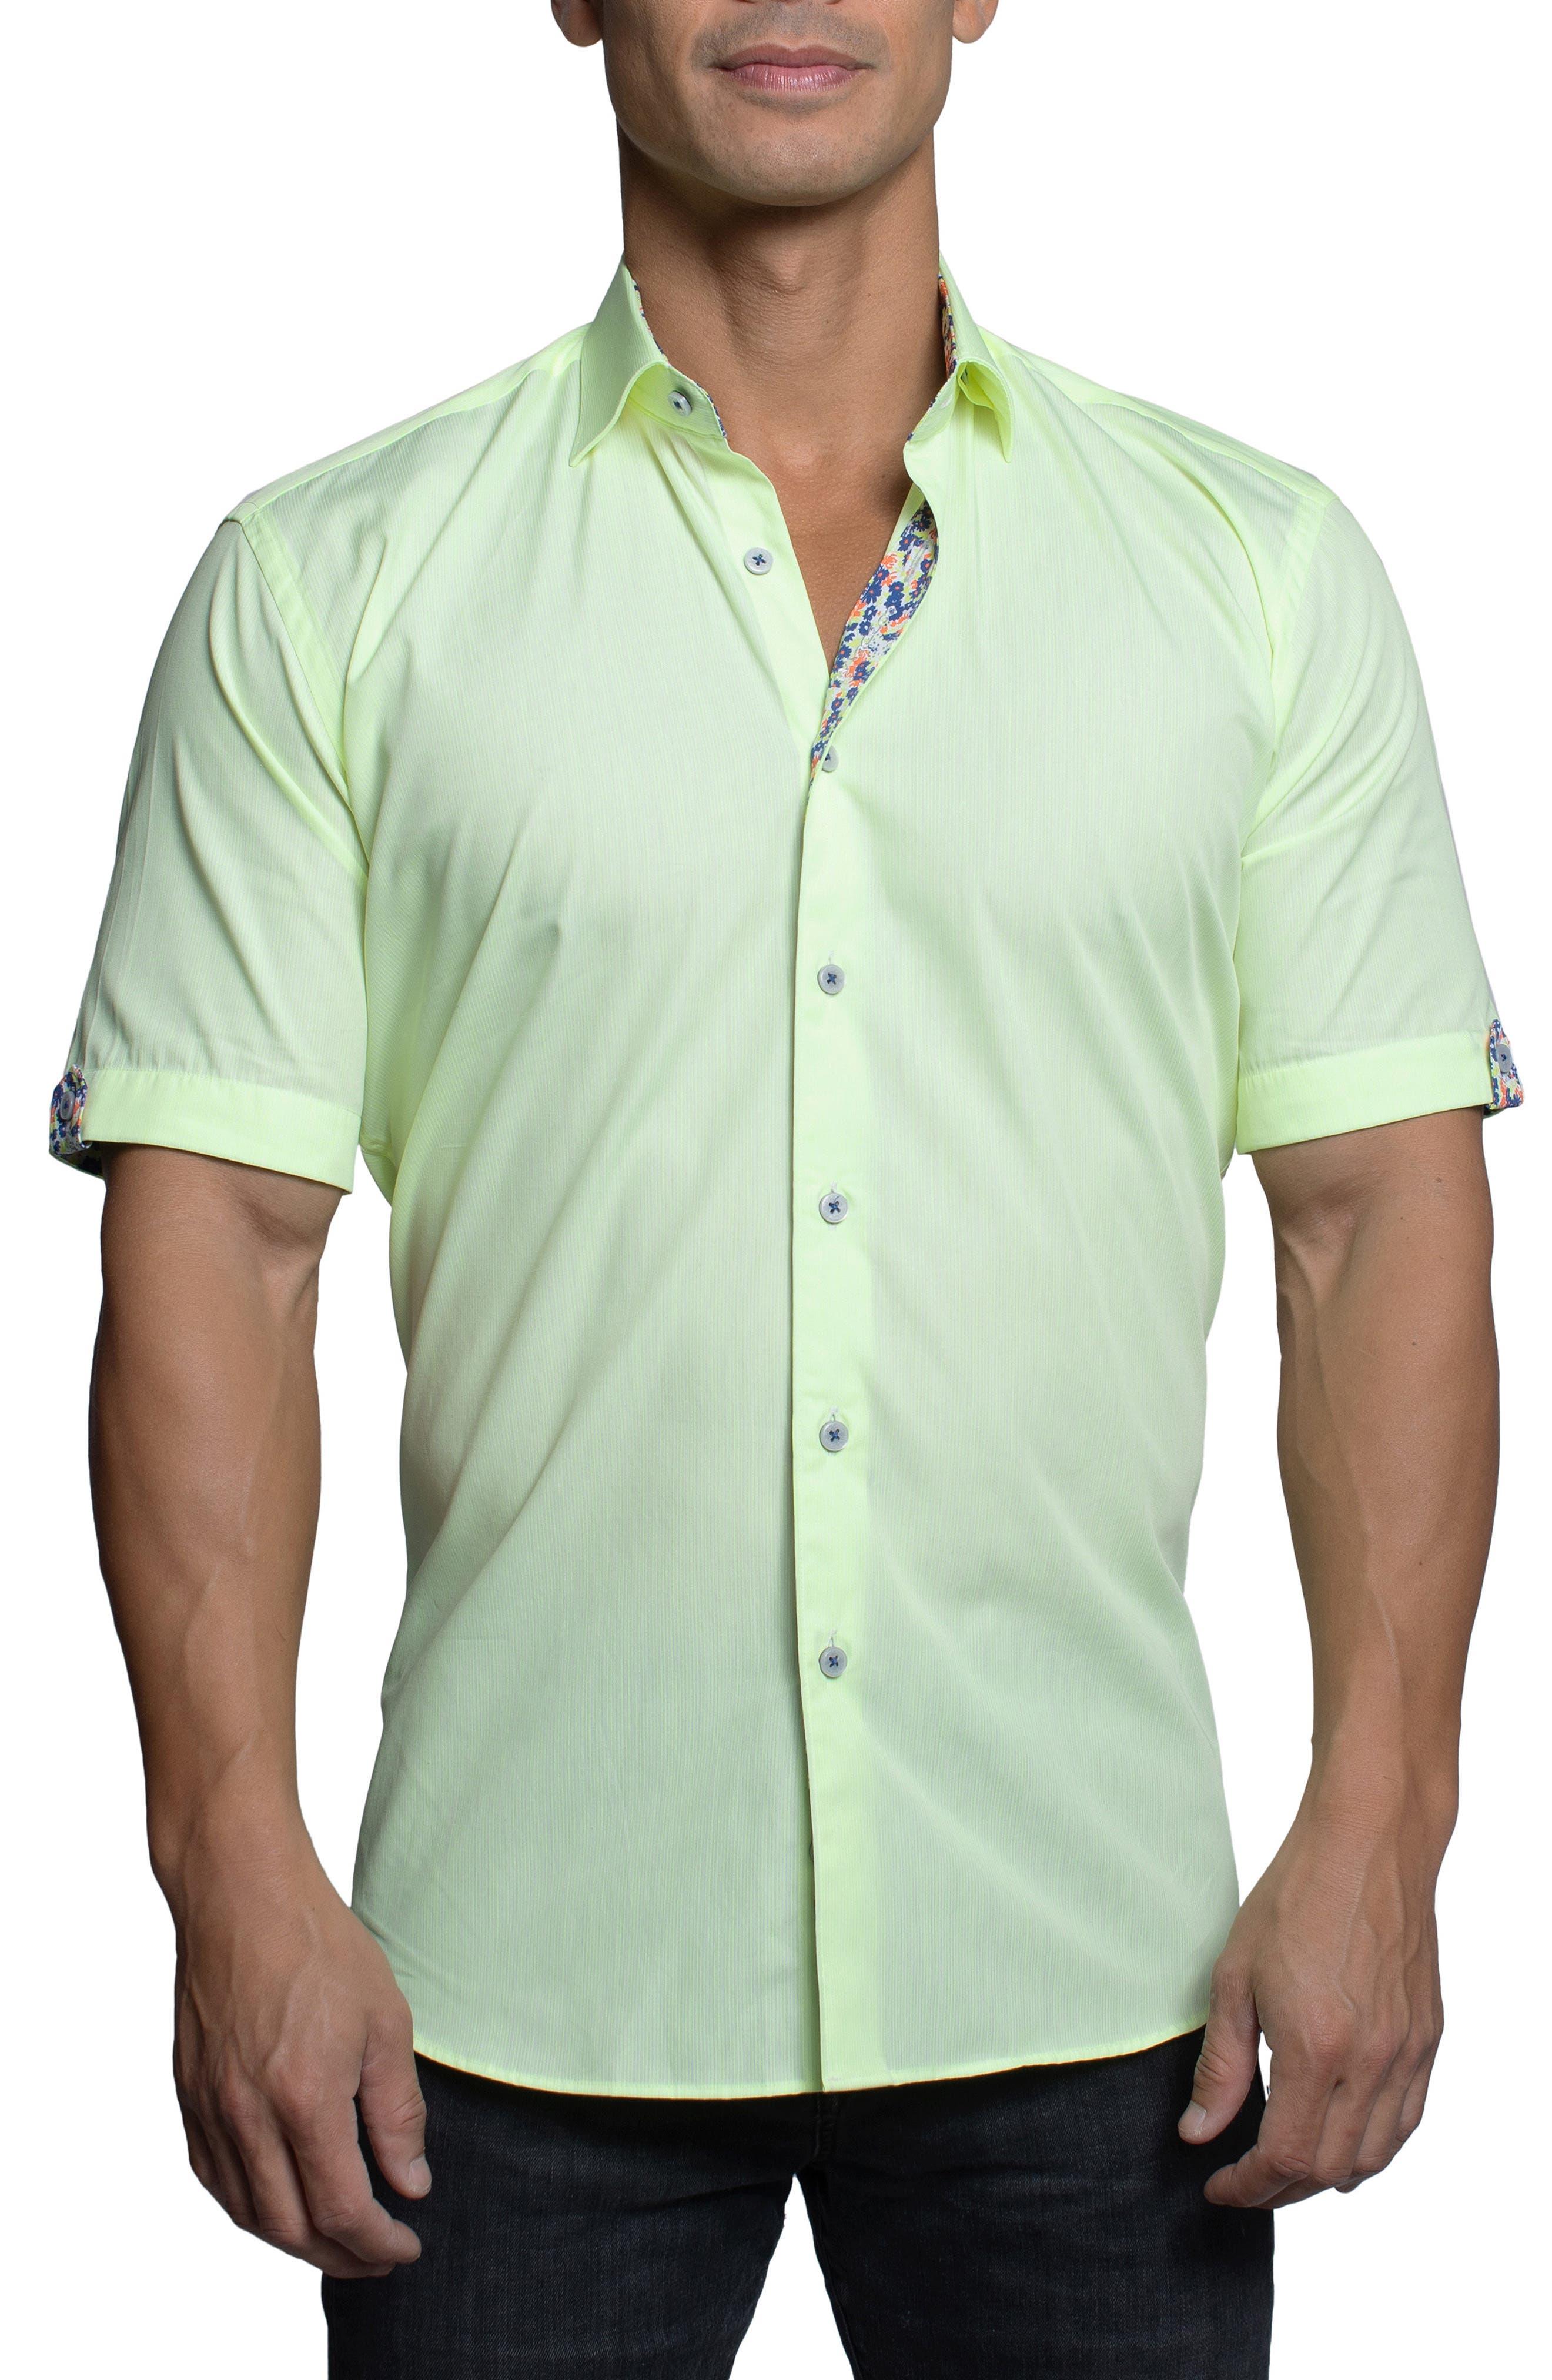 Galileo Stripe Short Sleeve Button-Up Shirt